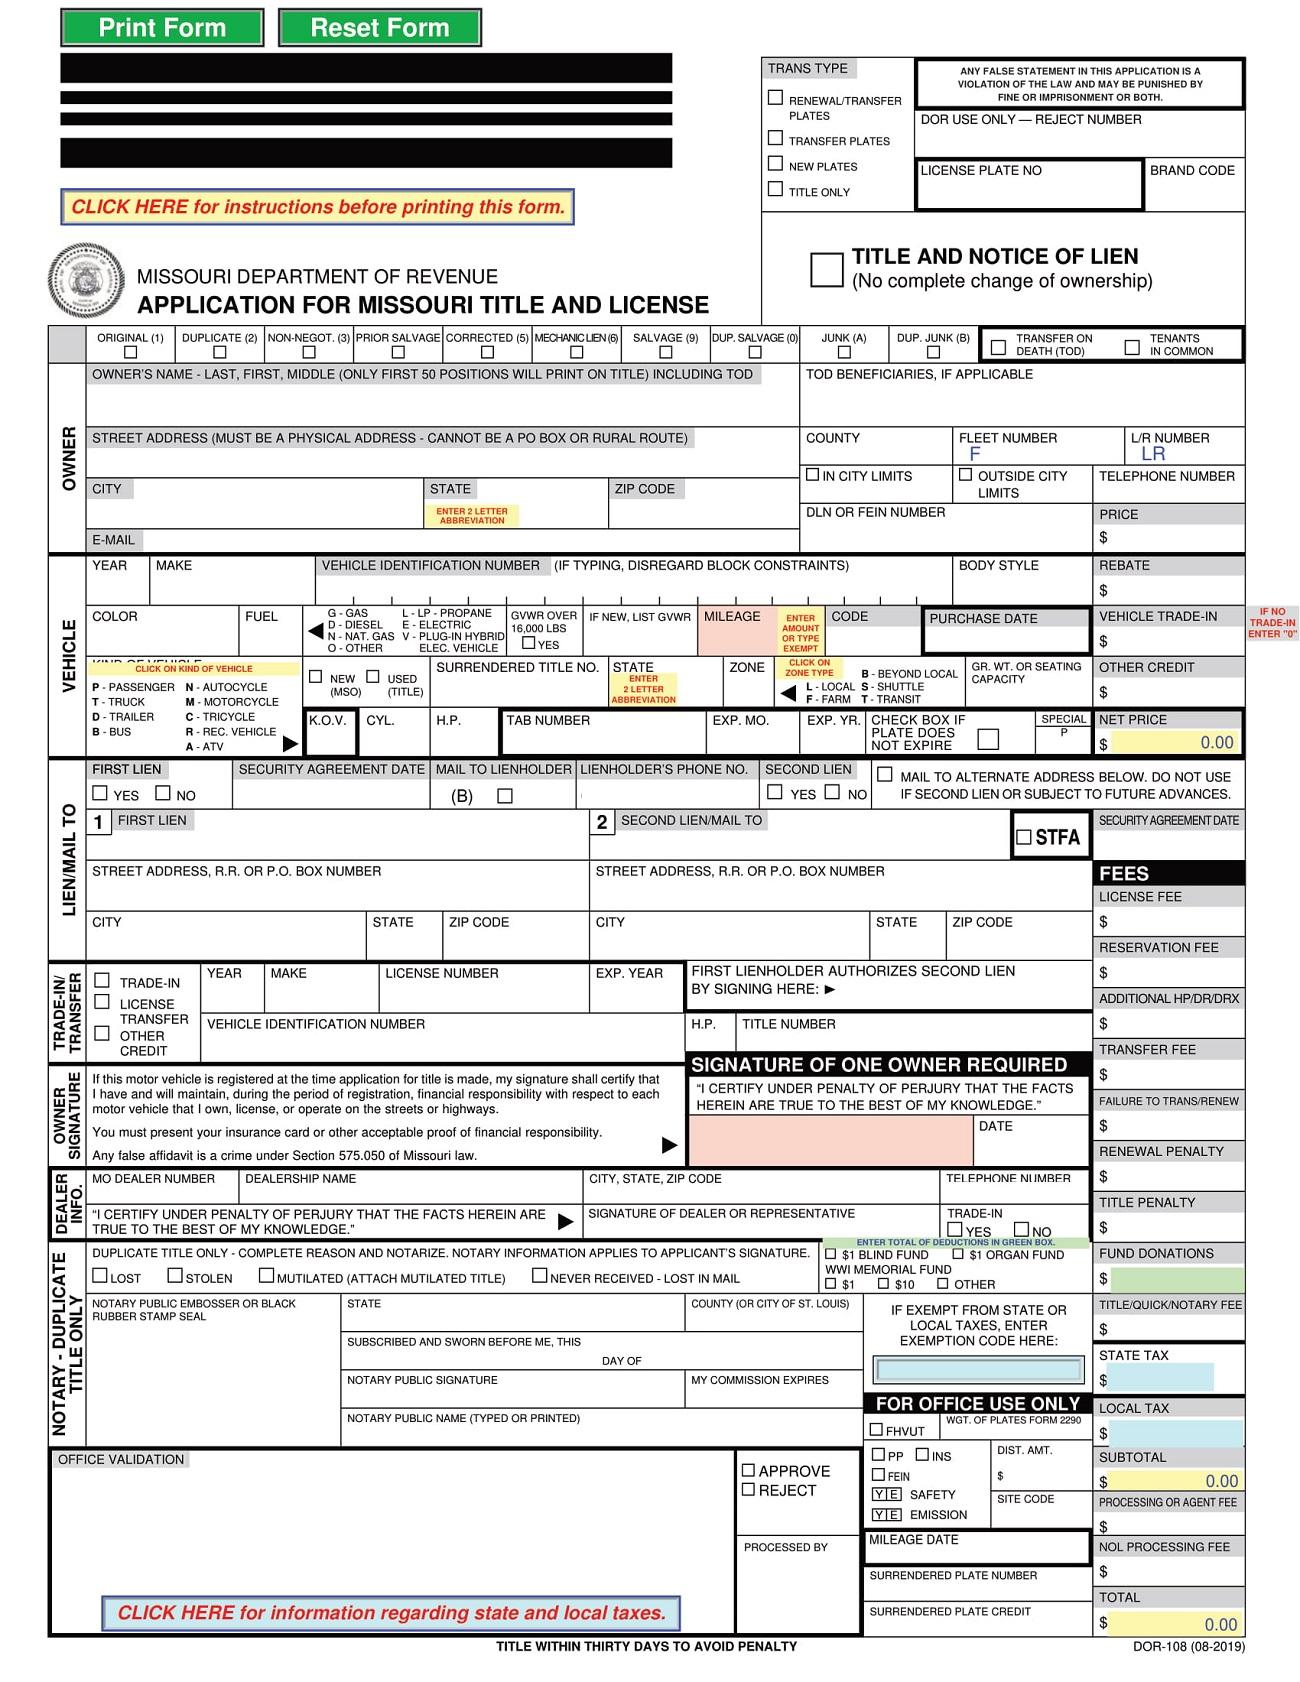 Form DOR-108 Missouri Application for Missouri Title and License Template PDF